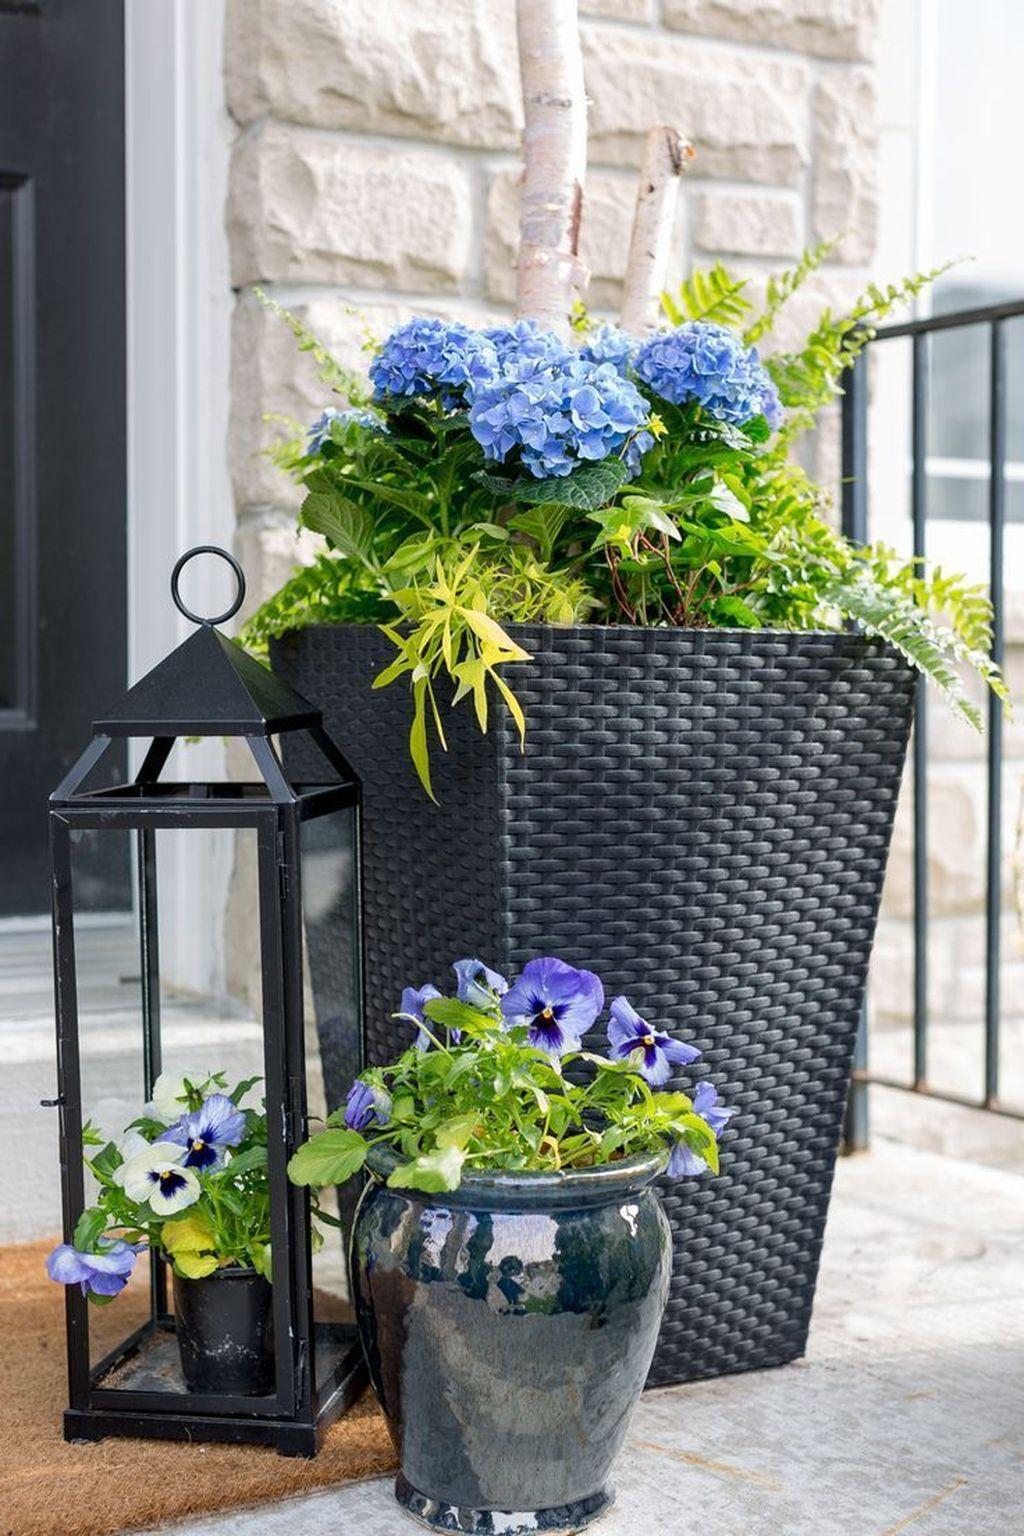 Inspiring Spring Planters Design Ideas For Front Door 30